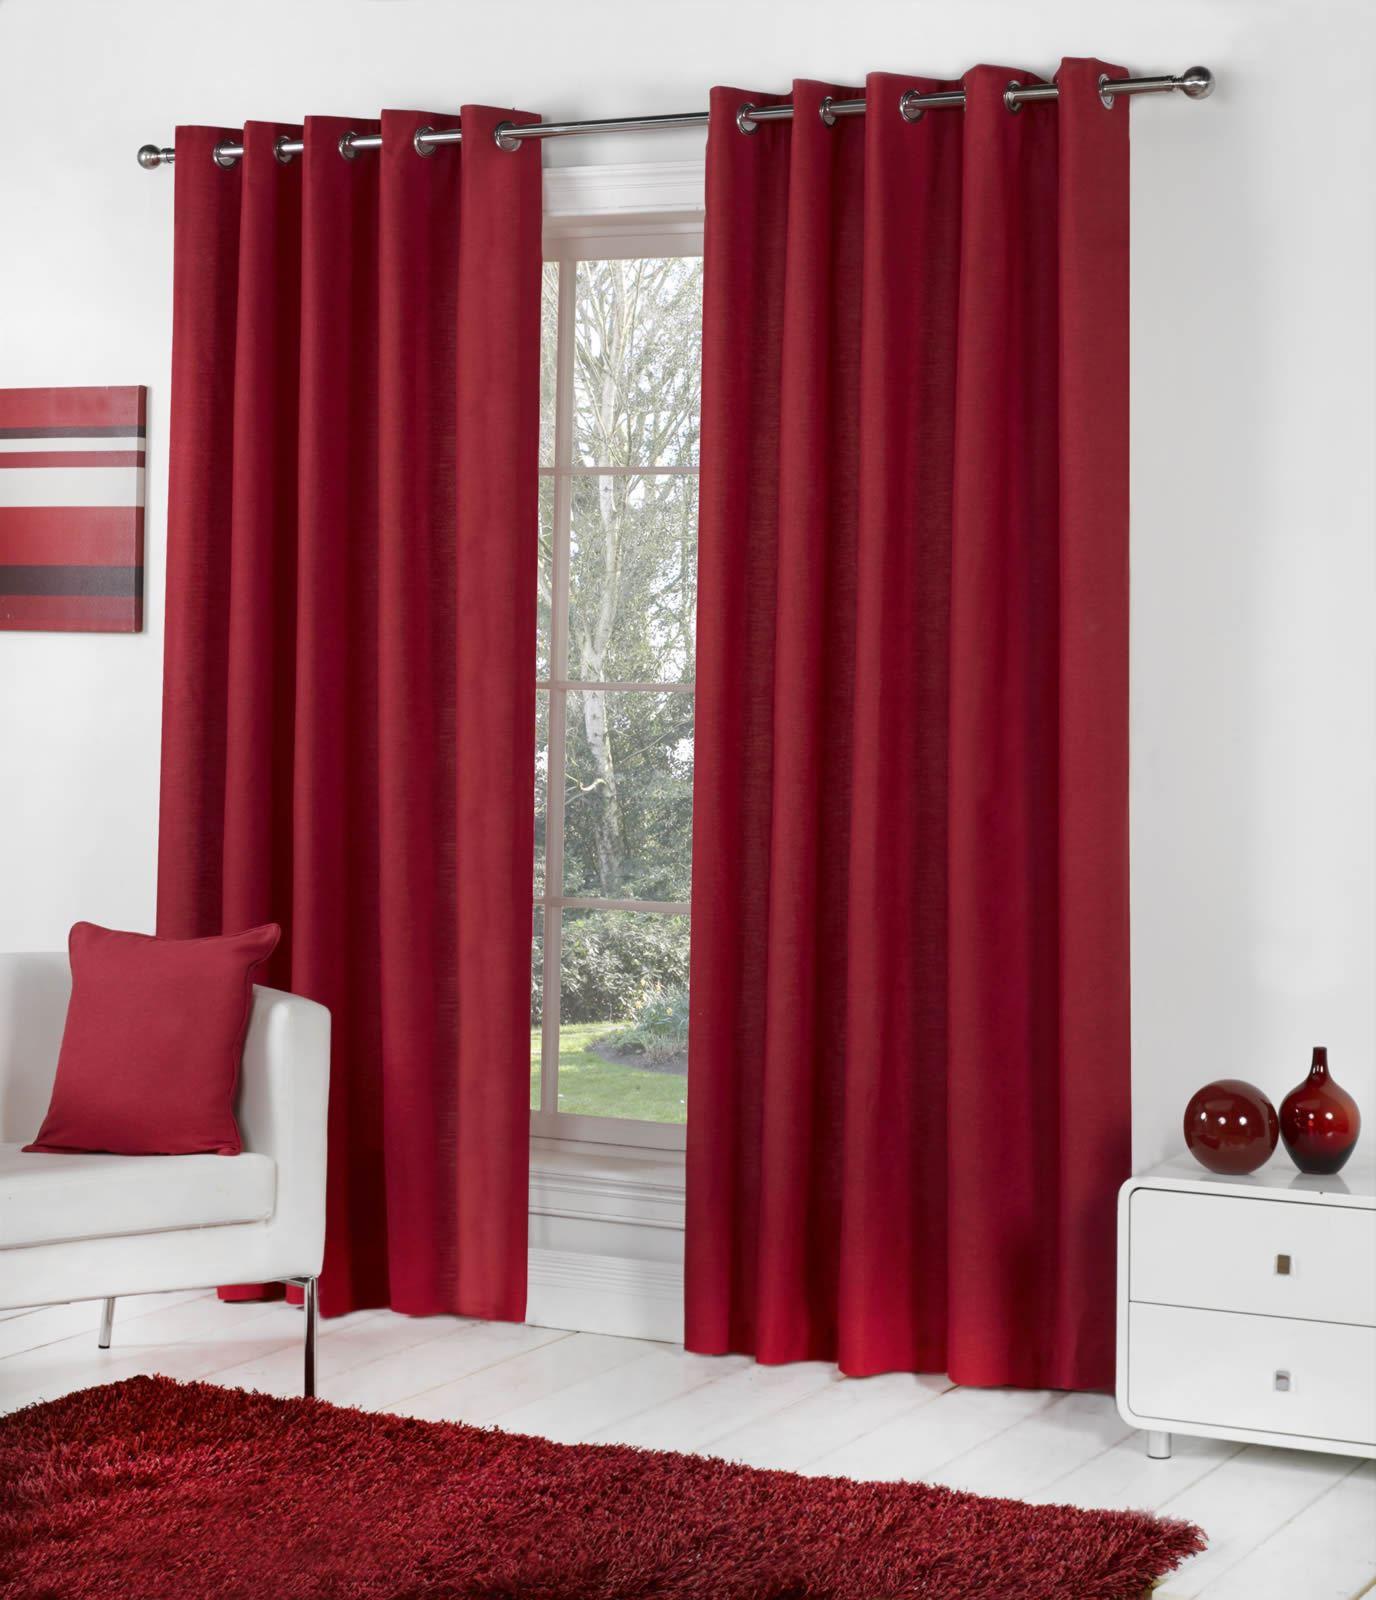 fertige vorhange kaufen angebote auf waterige. Black Bedroom Furniture Sets. Home Design Ideas